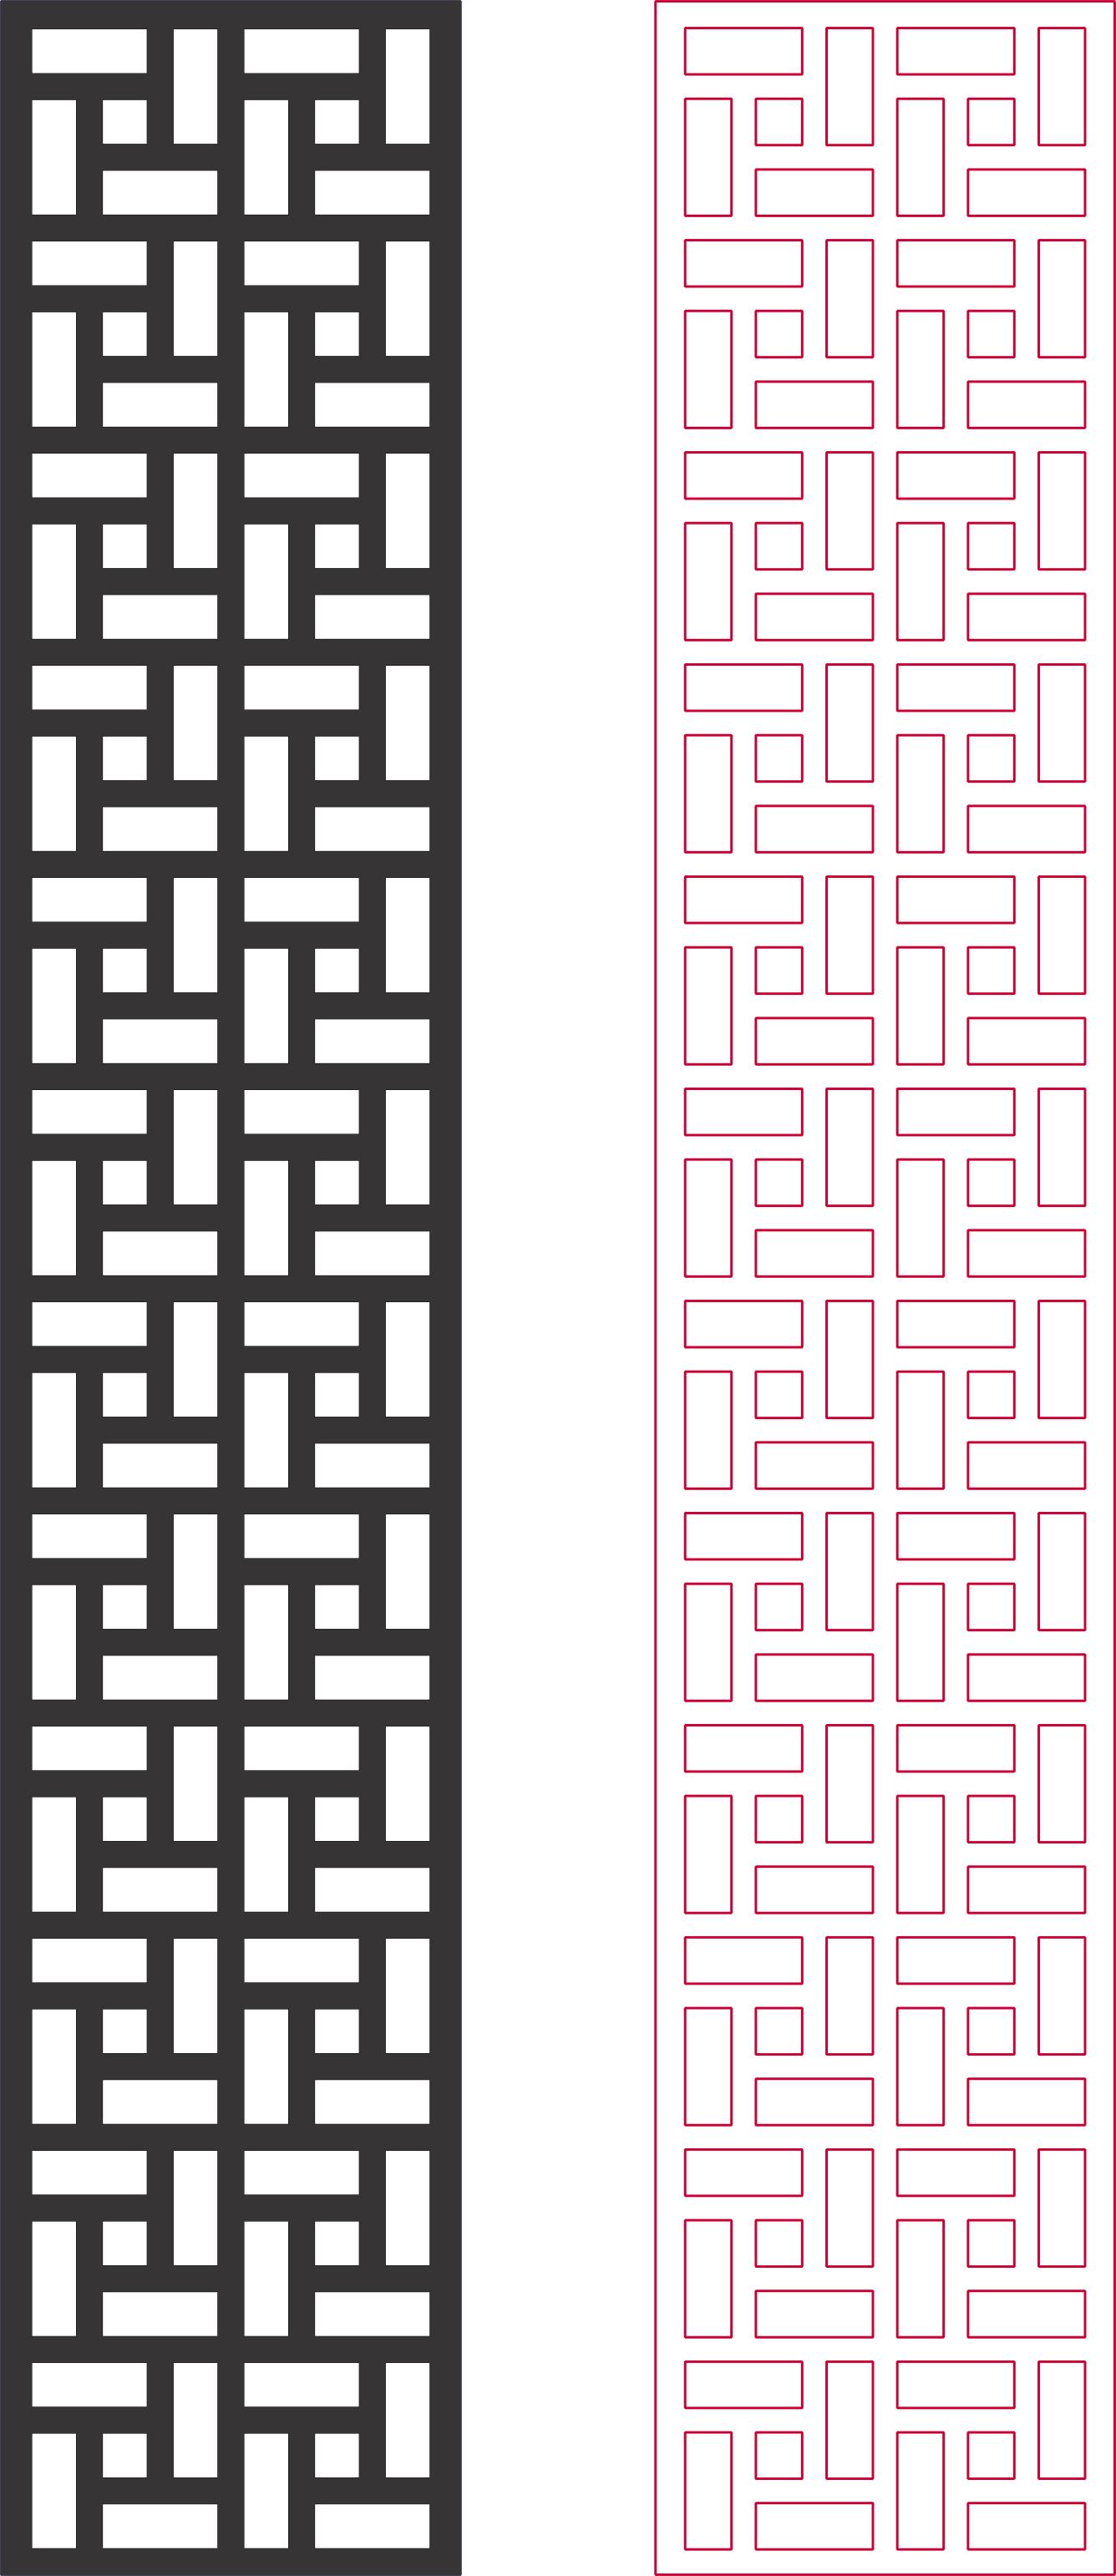 Dxf Pattern Designs 2d 121 DXF File